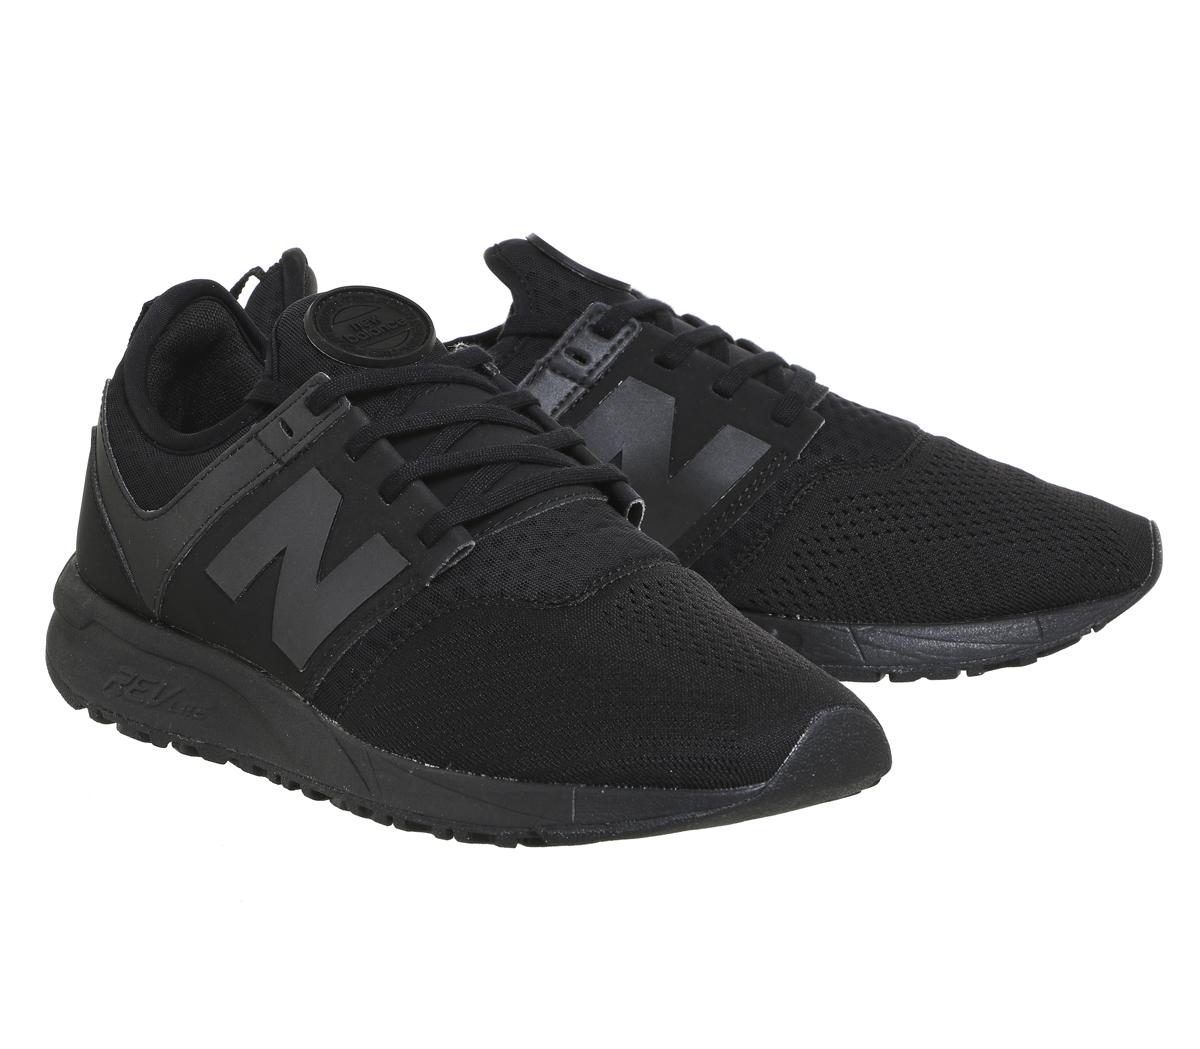 b4fa227a9495 Sentinel Womens New Balance 247 Trainers Black Mono Sport Trainers Shoes